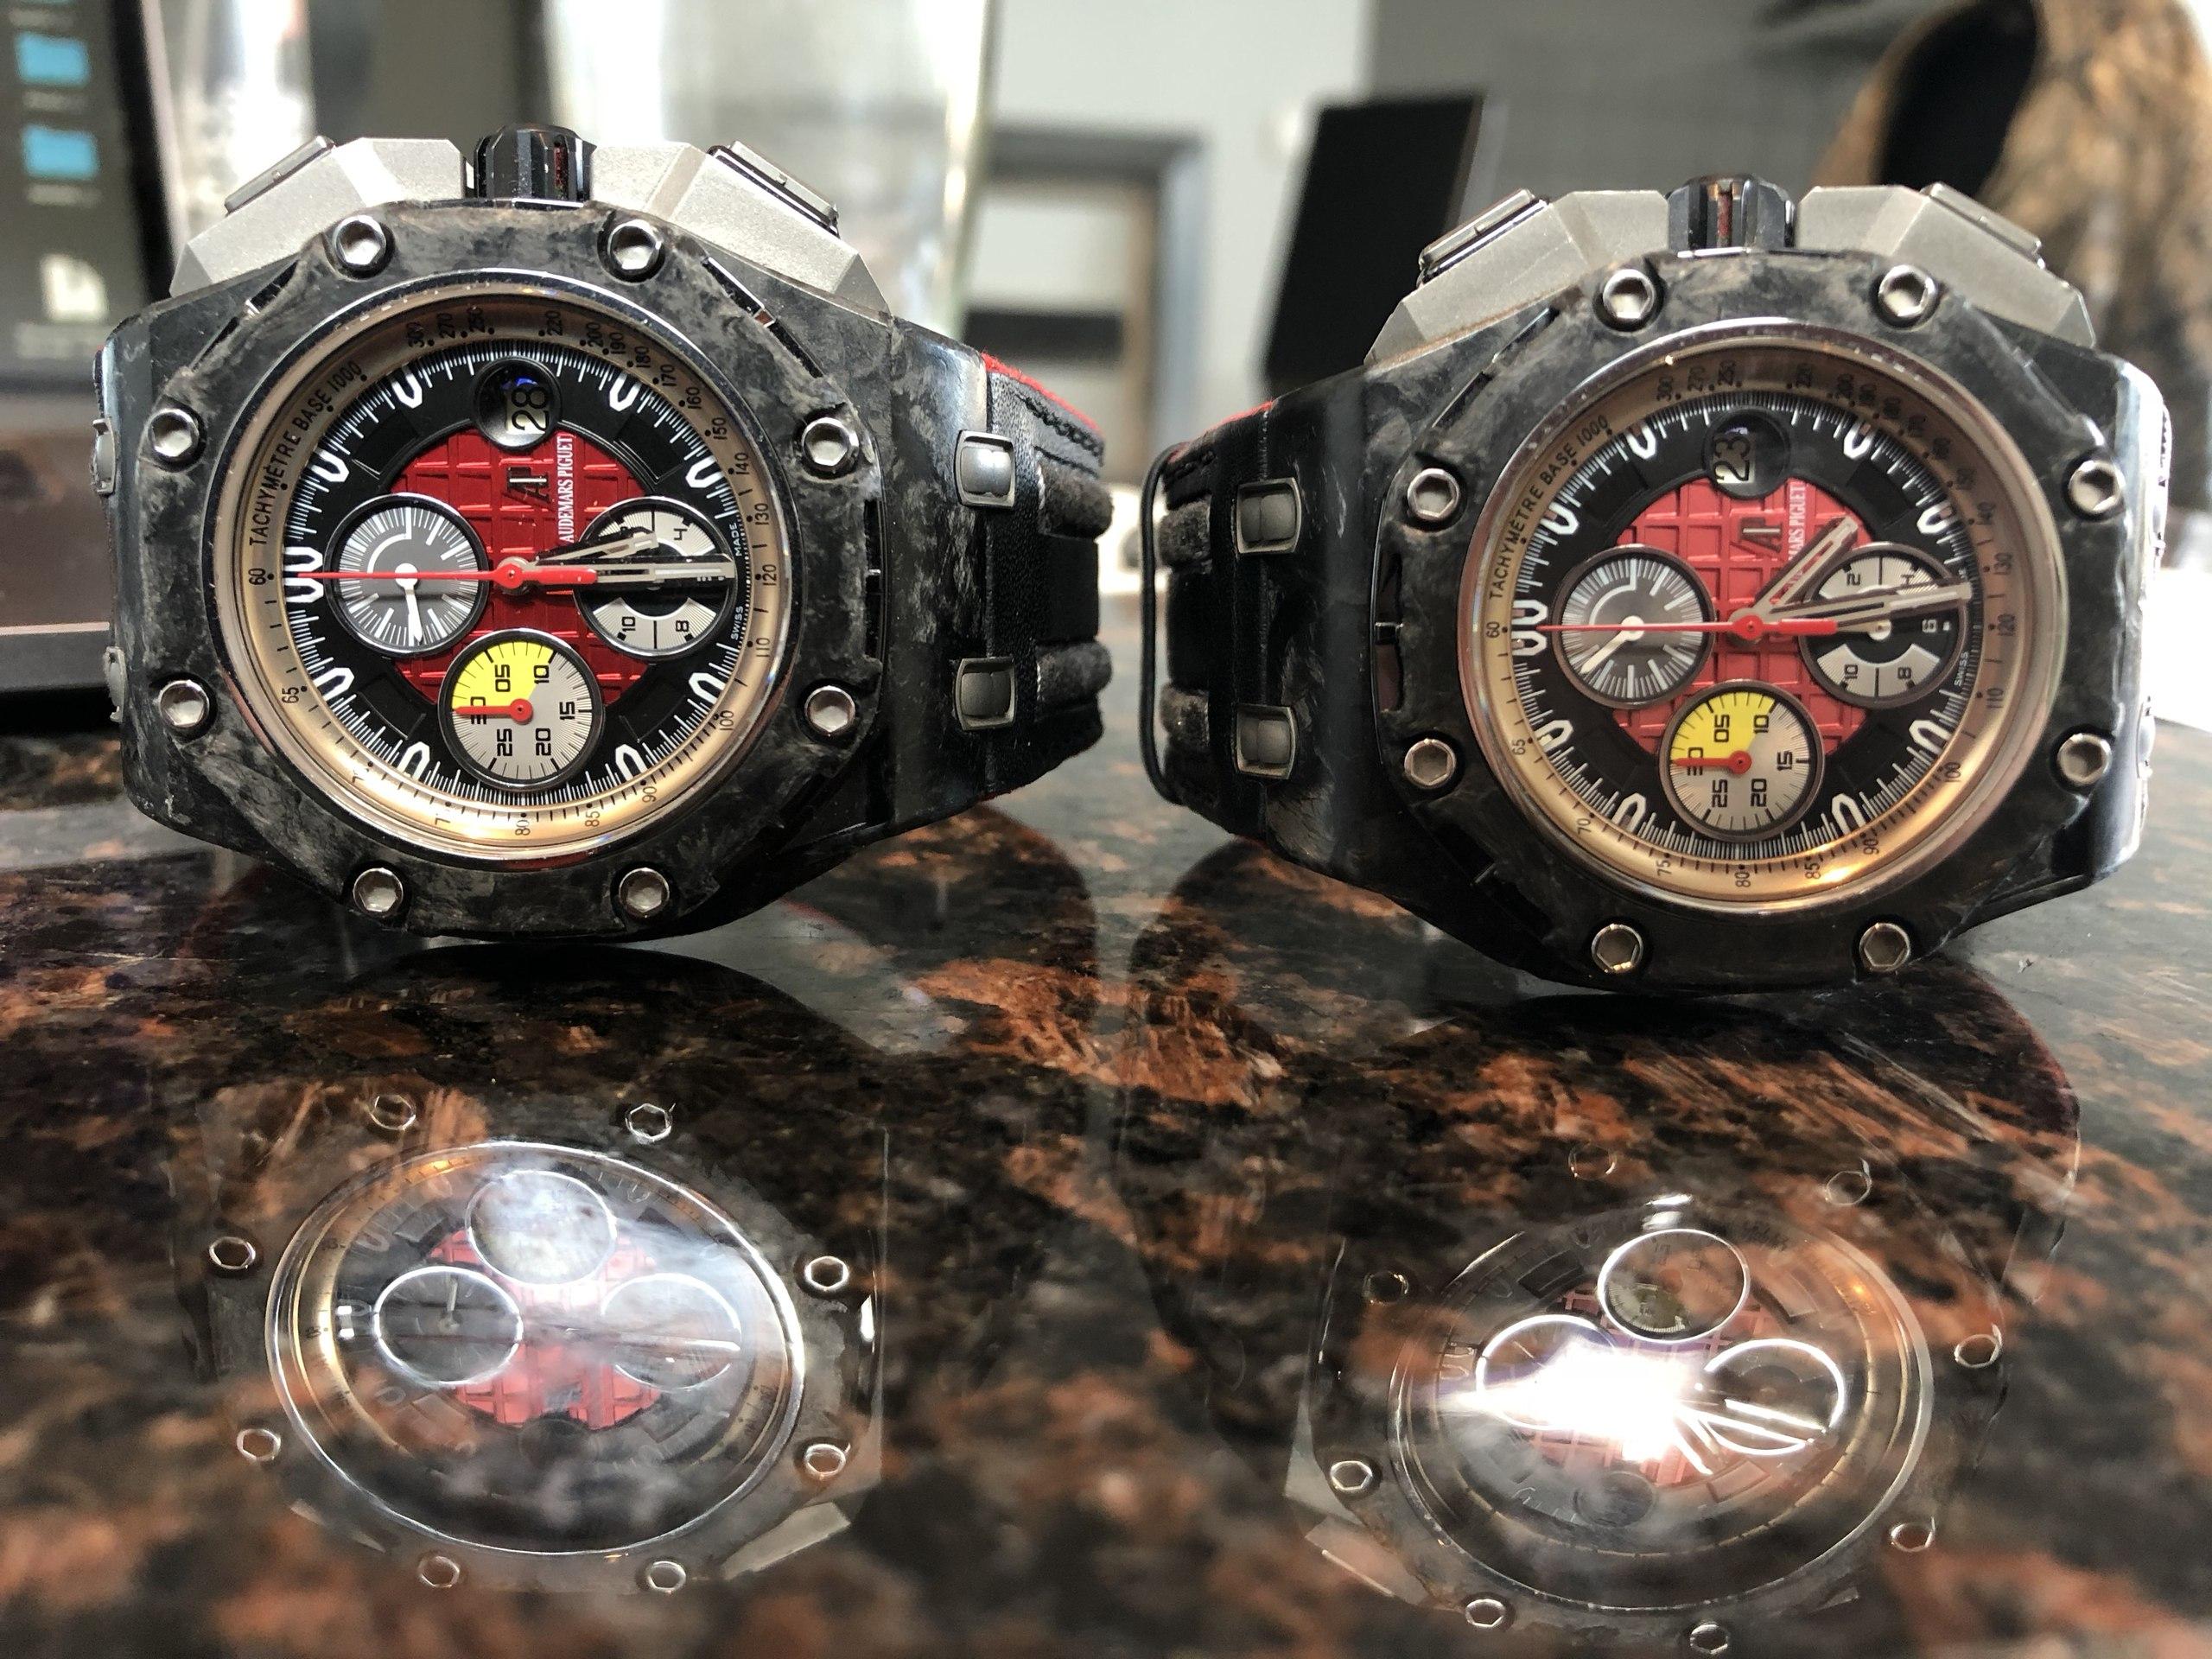 Audemars Piguet Grand Prix Carbon Fake Rolex Forums Rolex Watch